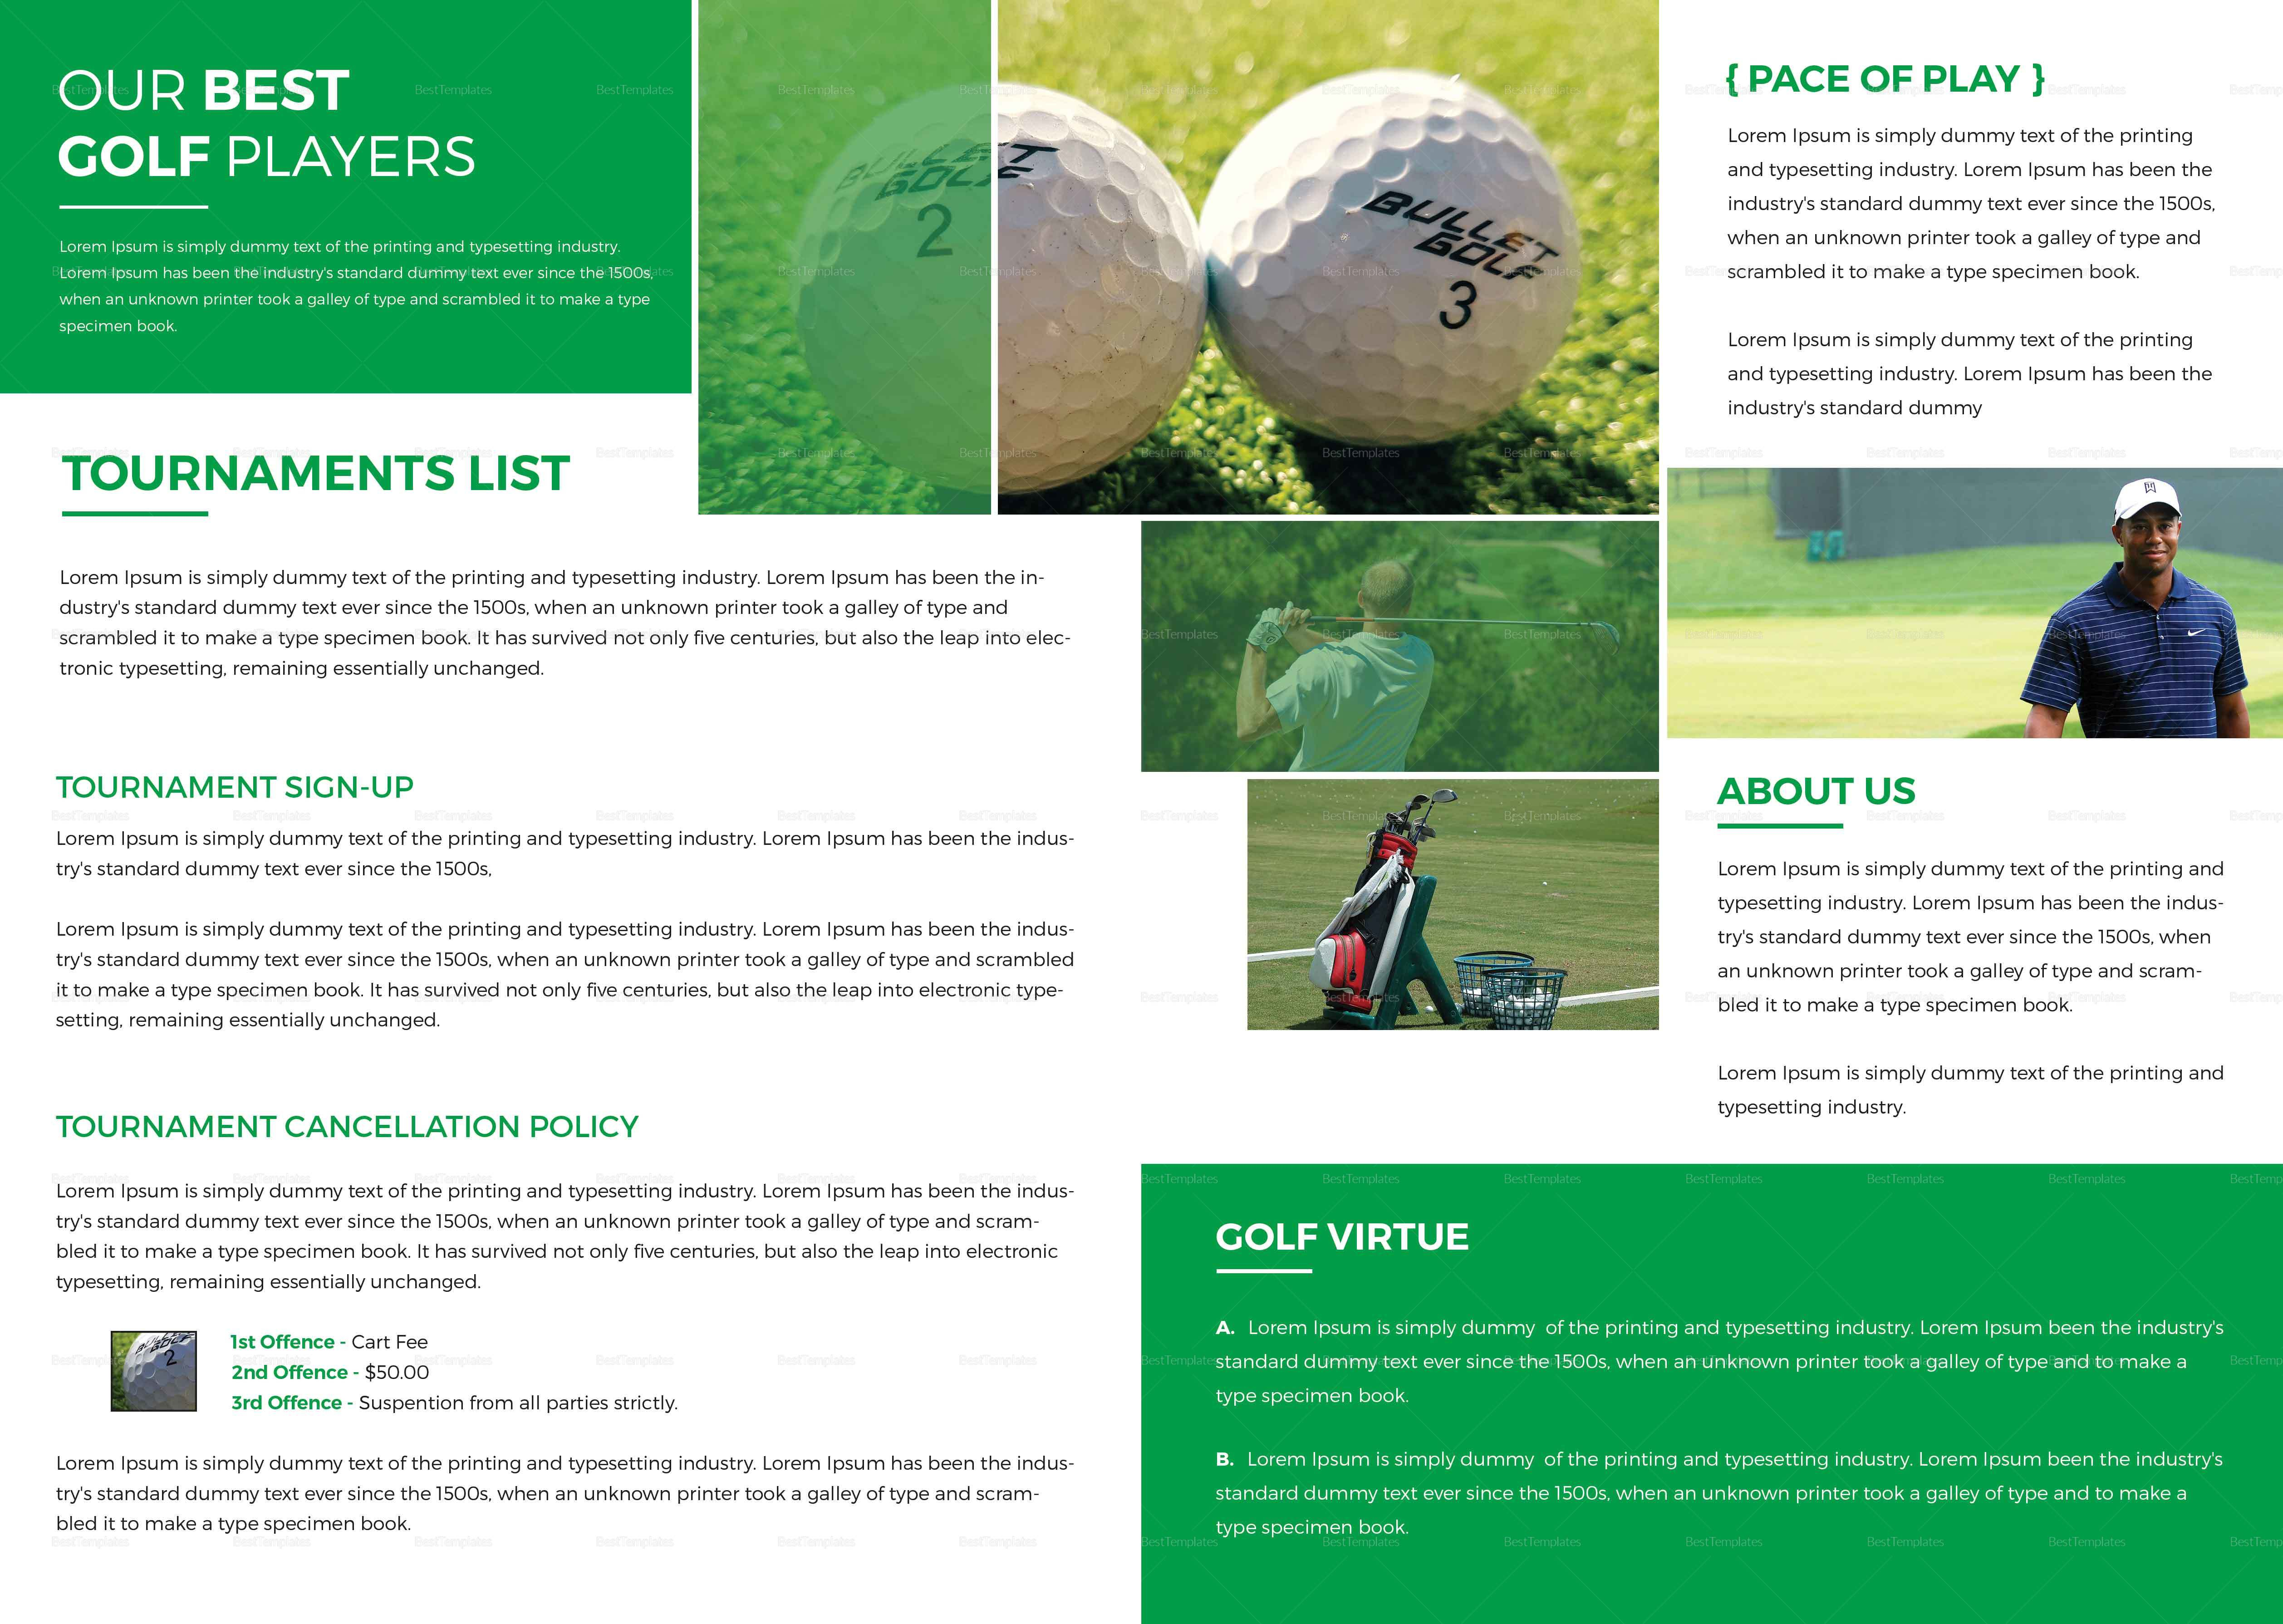 Golf tournament bi fold brochure design template in word for Golf tournament brochure template